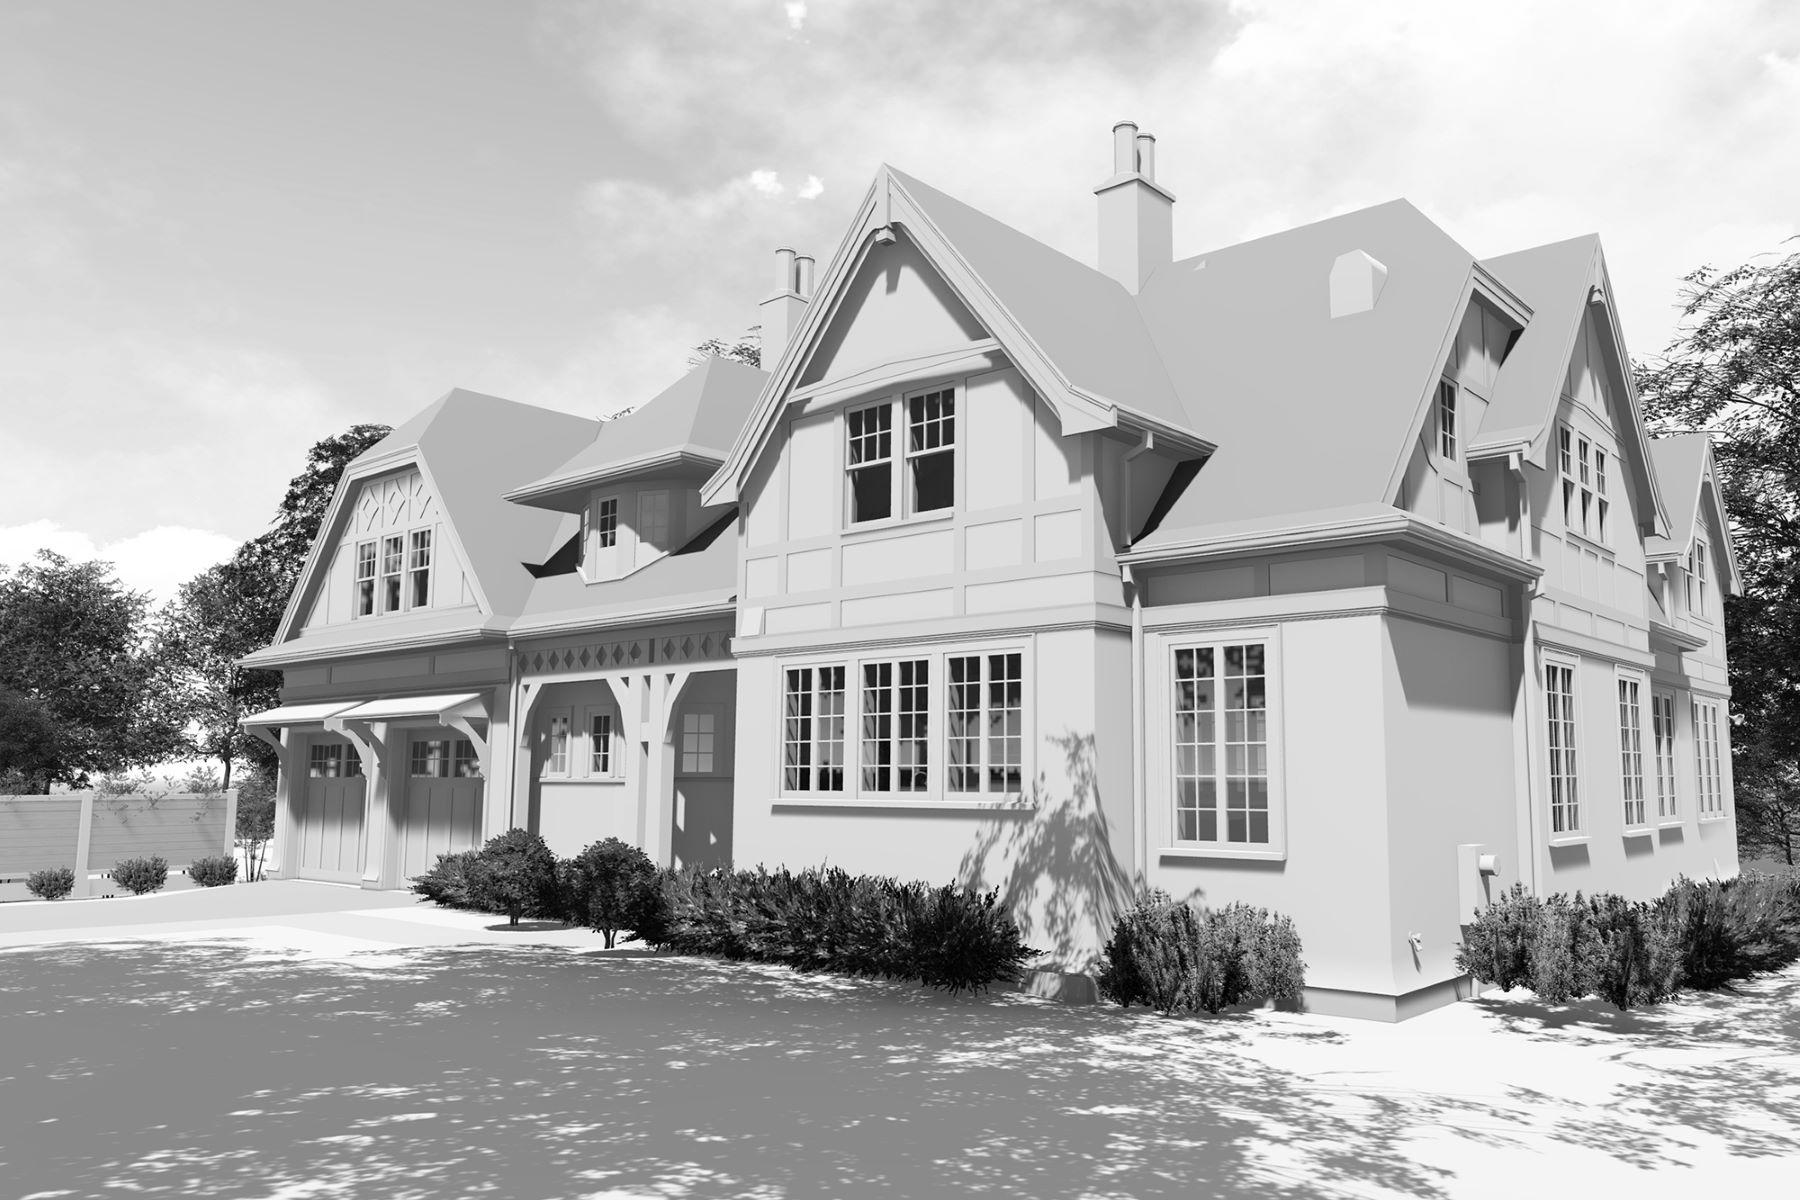 Single Family Homes for Sale at 6 Adams Street, Lexington 6 Adams St Lexington, Massachusetts 02420 United States